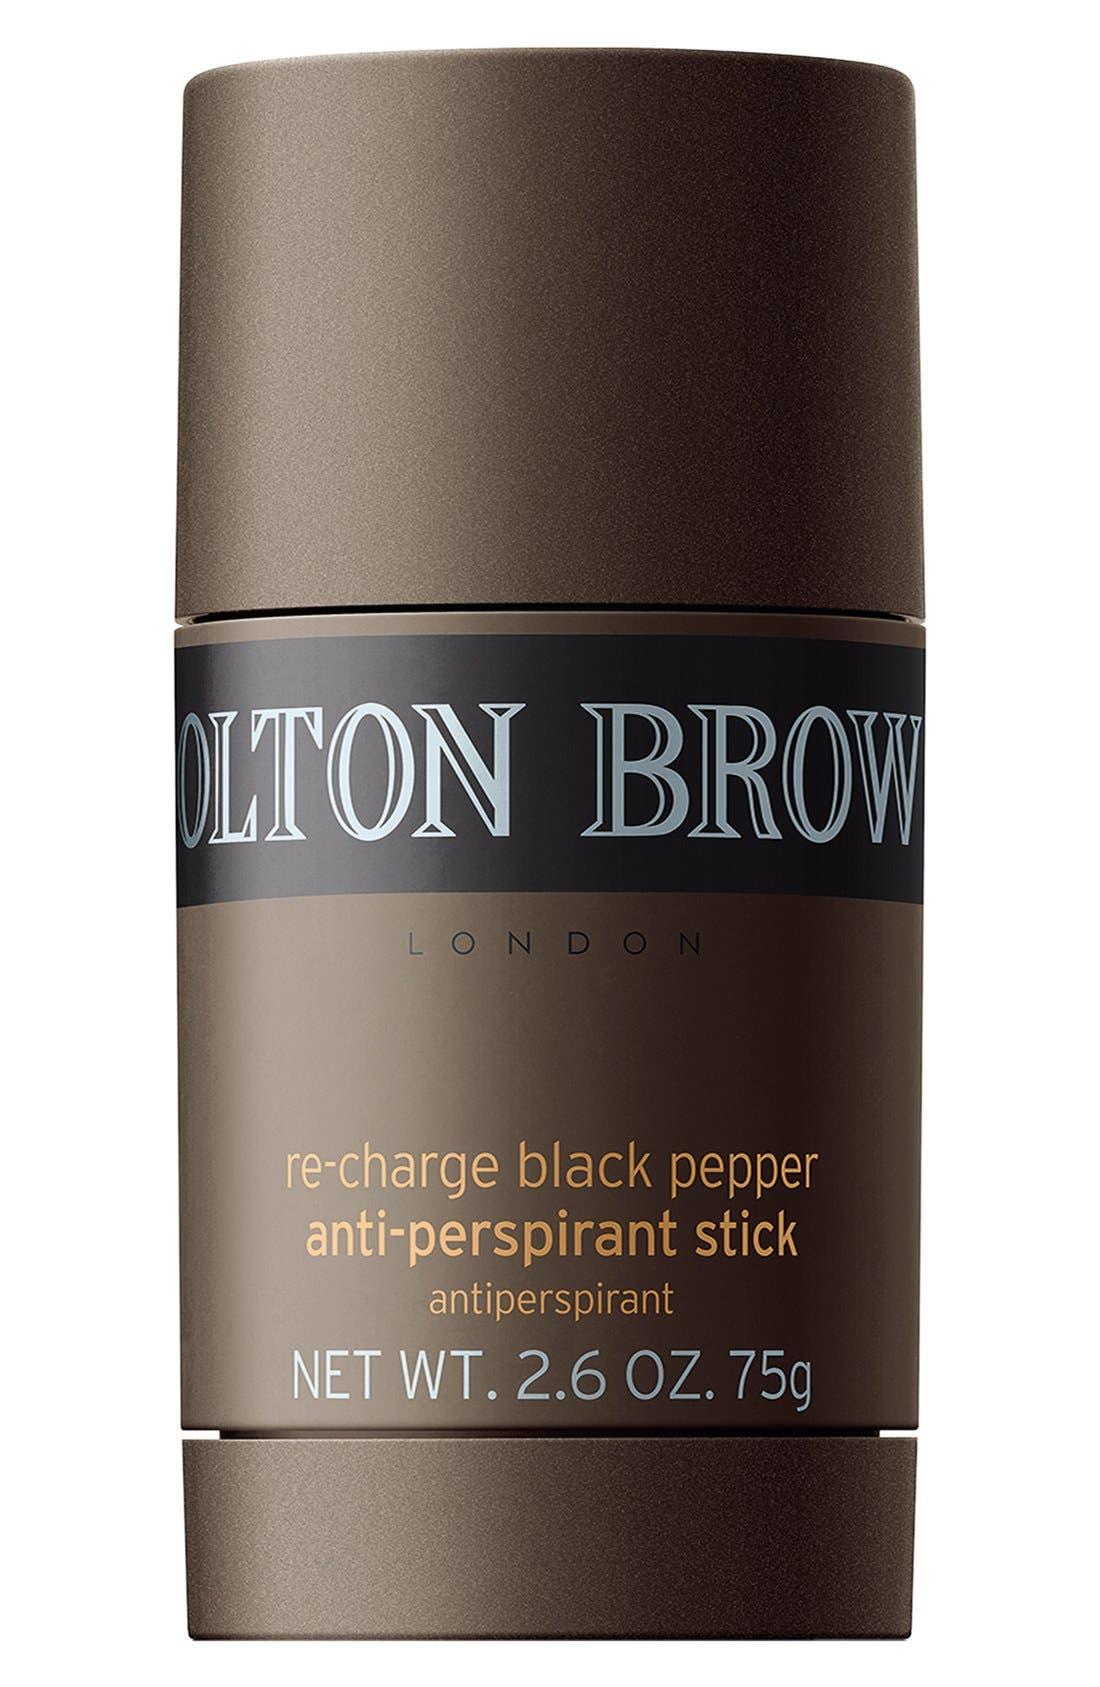 MOLTON BROWN London Black Pepper Anti-Perspirant Stick